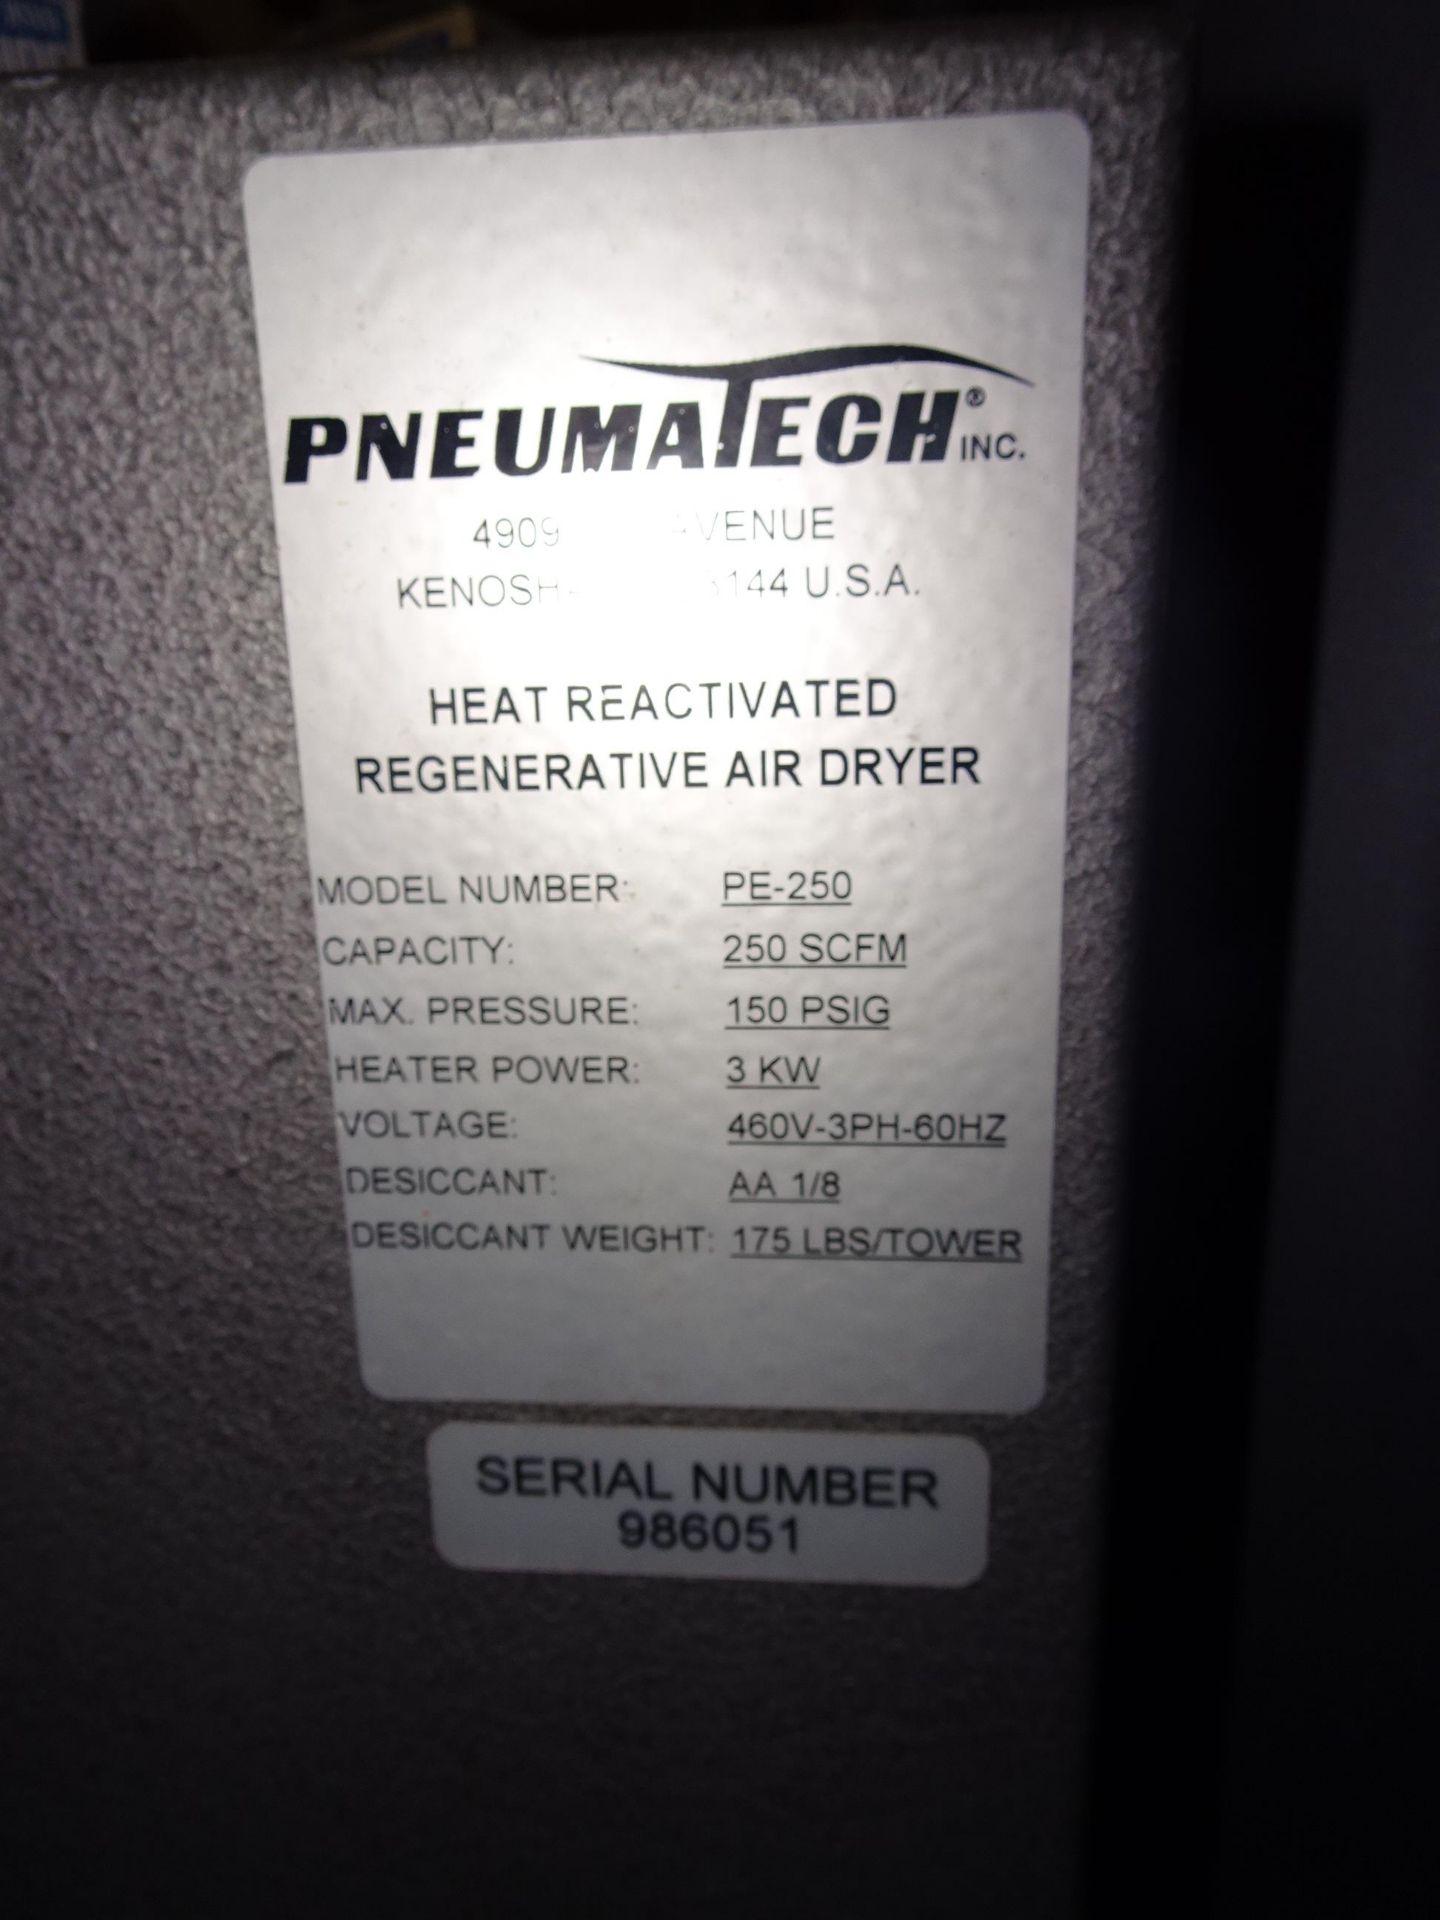 Lot 31 - Pneumatech Model PE-250 Regenerative Dessicant Air Drier 250 SCFM @ 150 PSIG Capacity